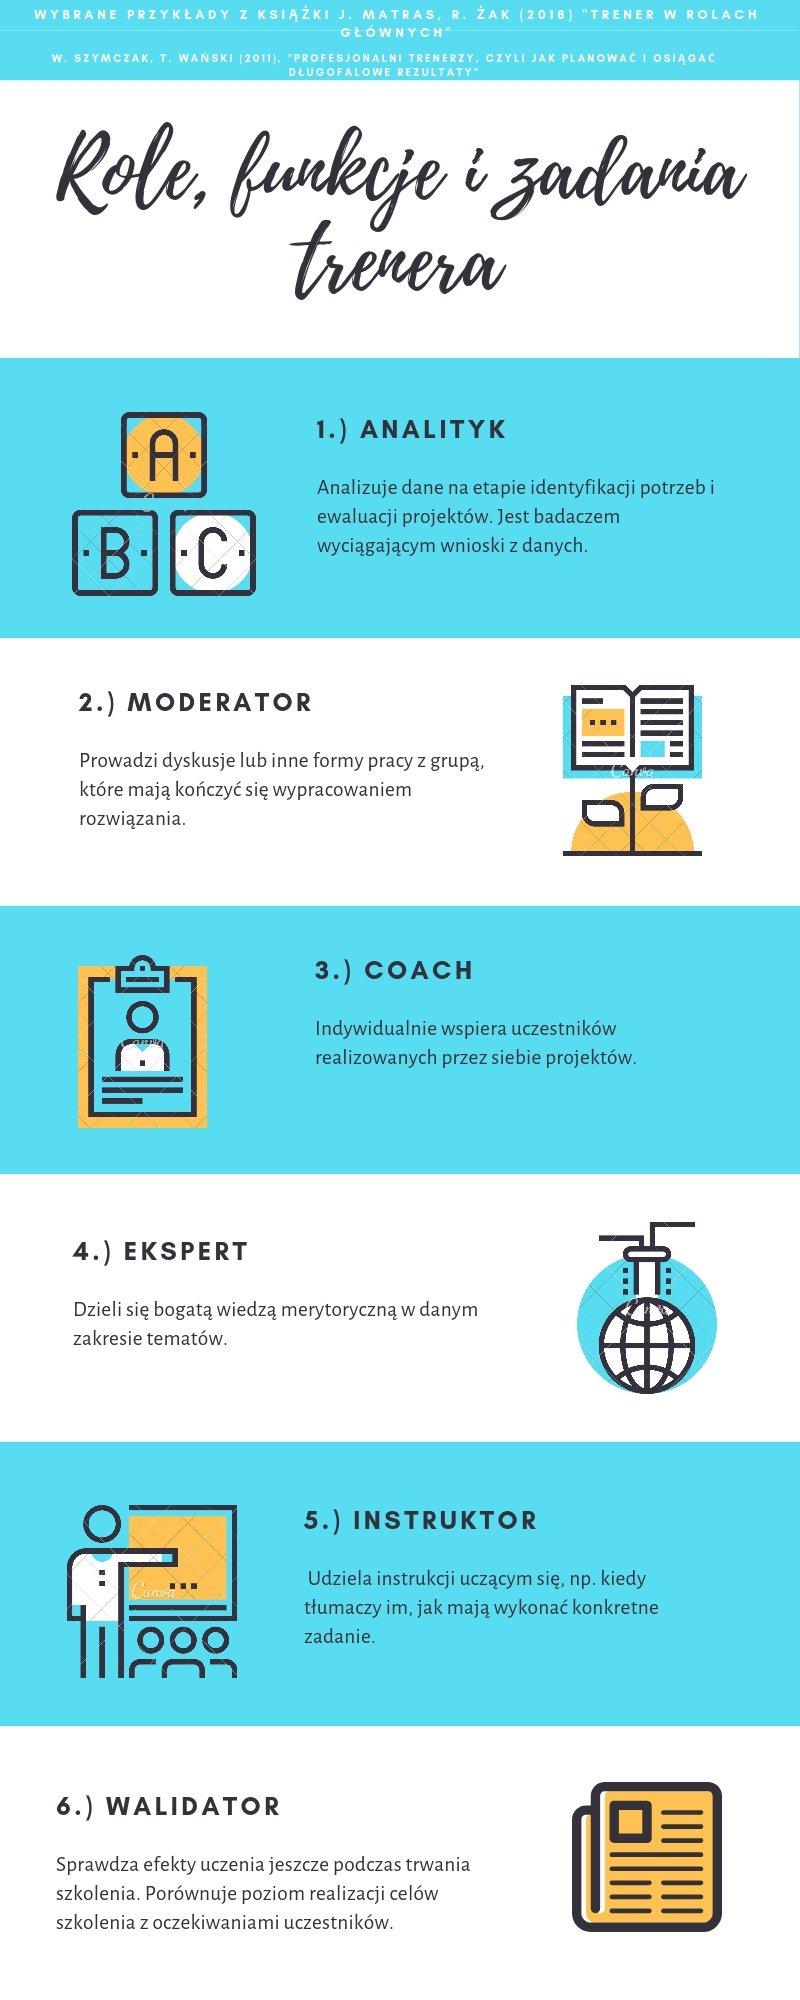 role-funkcje-i-zadania-trenera